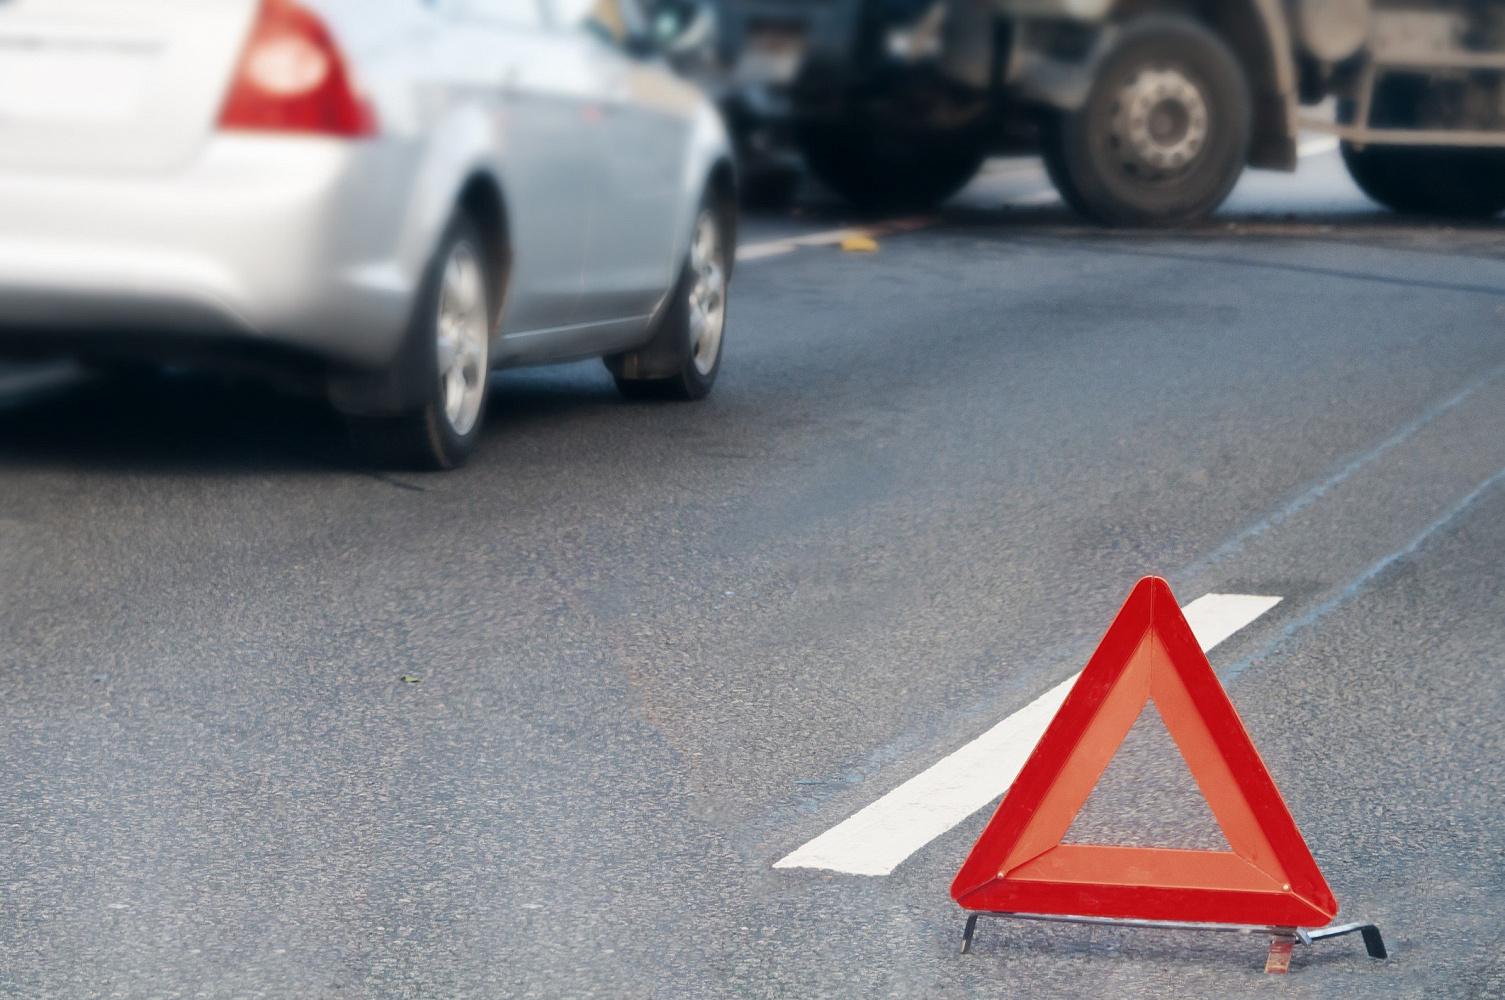 Три человека пострадали в ДТП с маршруткой на Московском проспекте Брянска